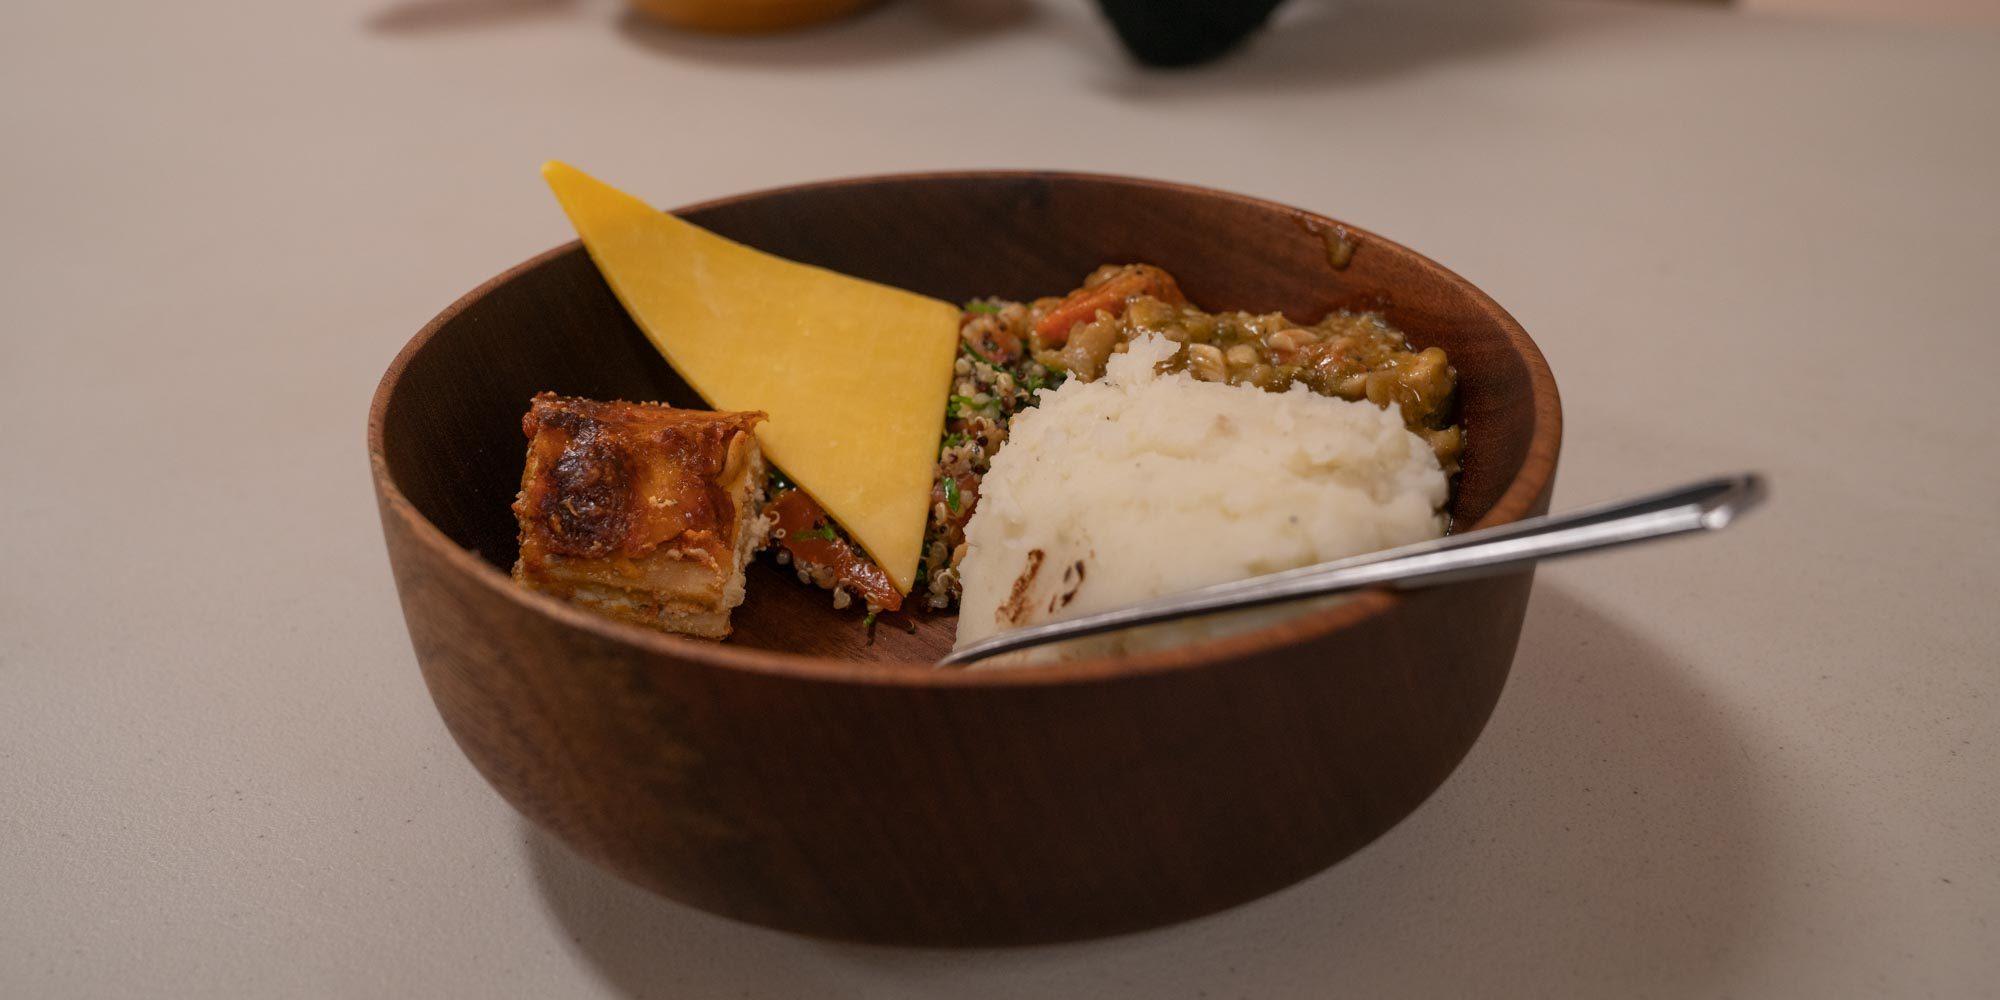 potluck bowl